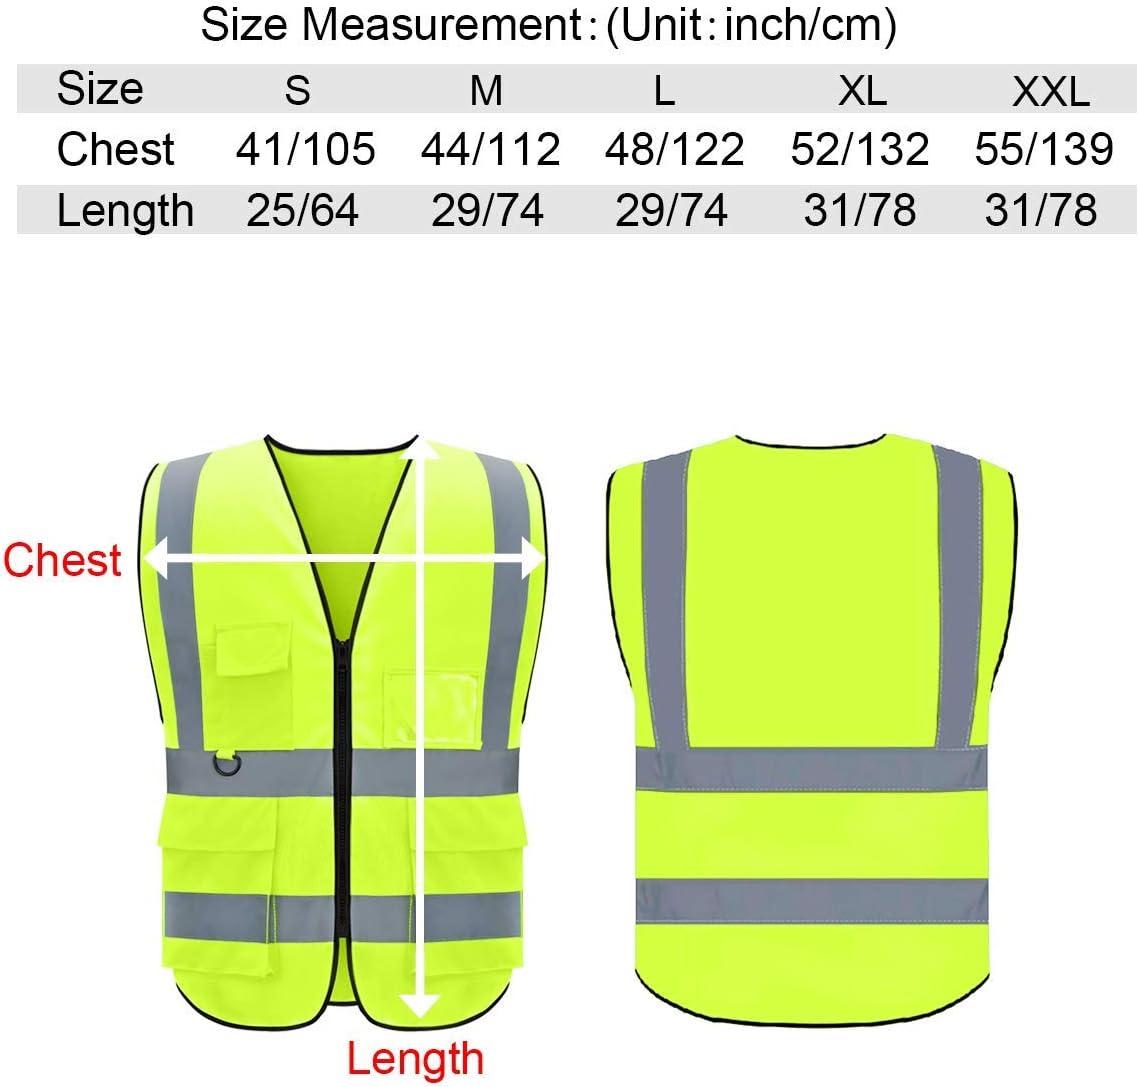 10 Pack Custom Logo Safety Vest Customize Class 2 Visibility Reflective Vests Bulk with Pockets and Zipper